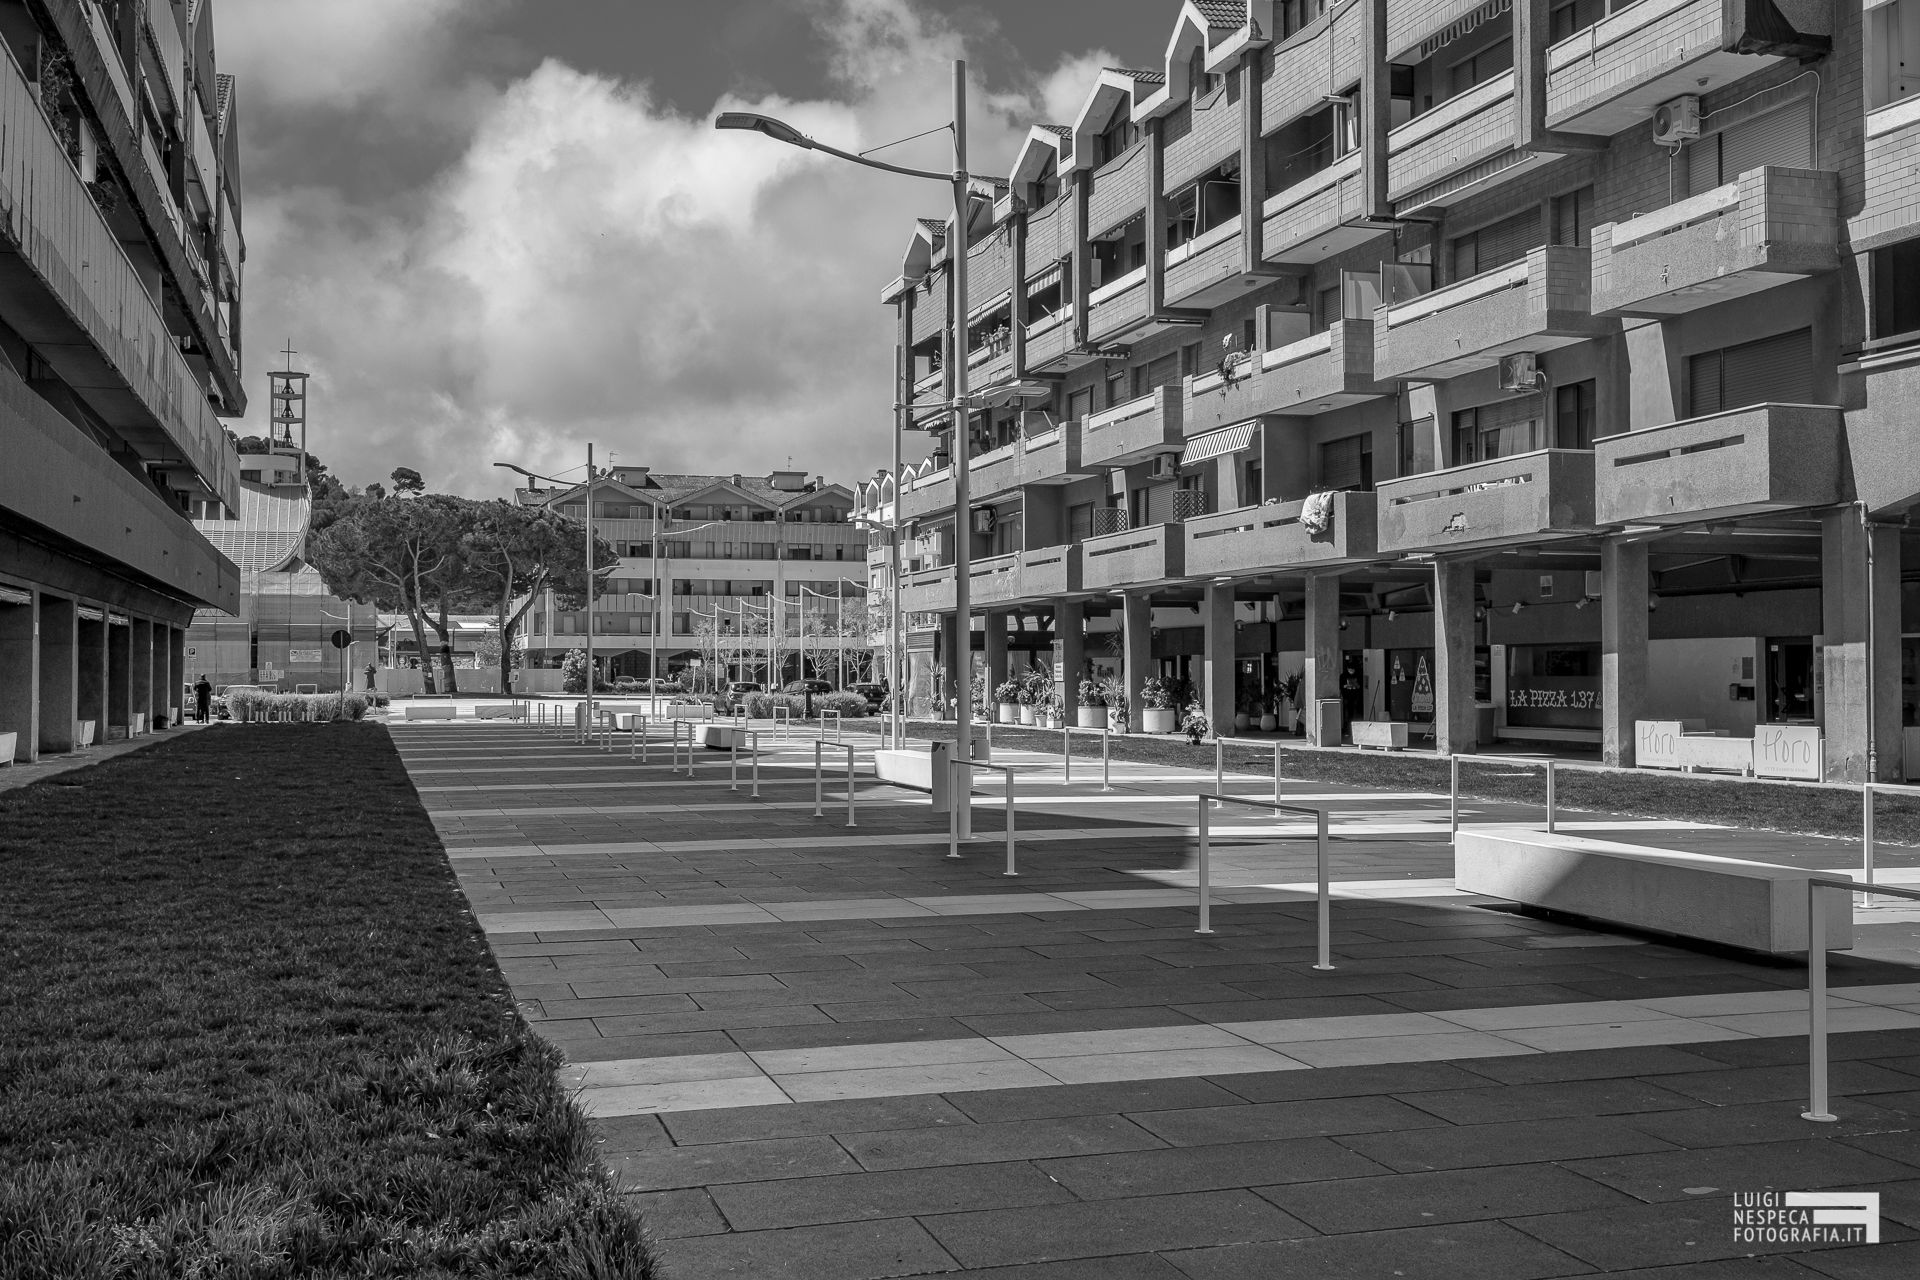 Francavilla al Mare - Piazza SantAlfonso  in Lockdown